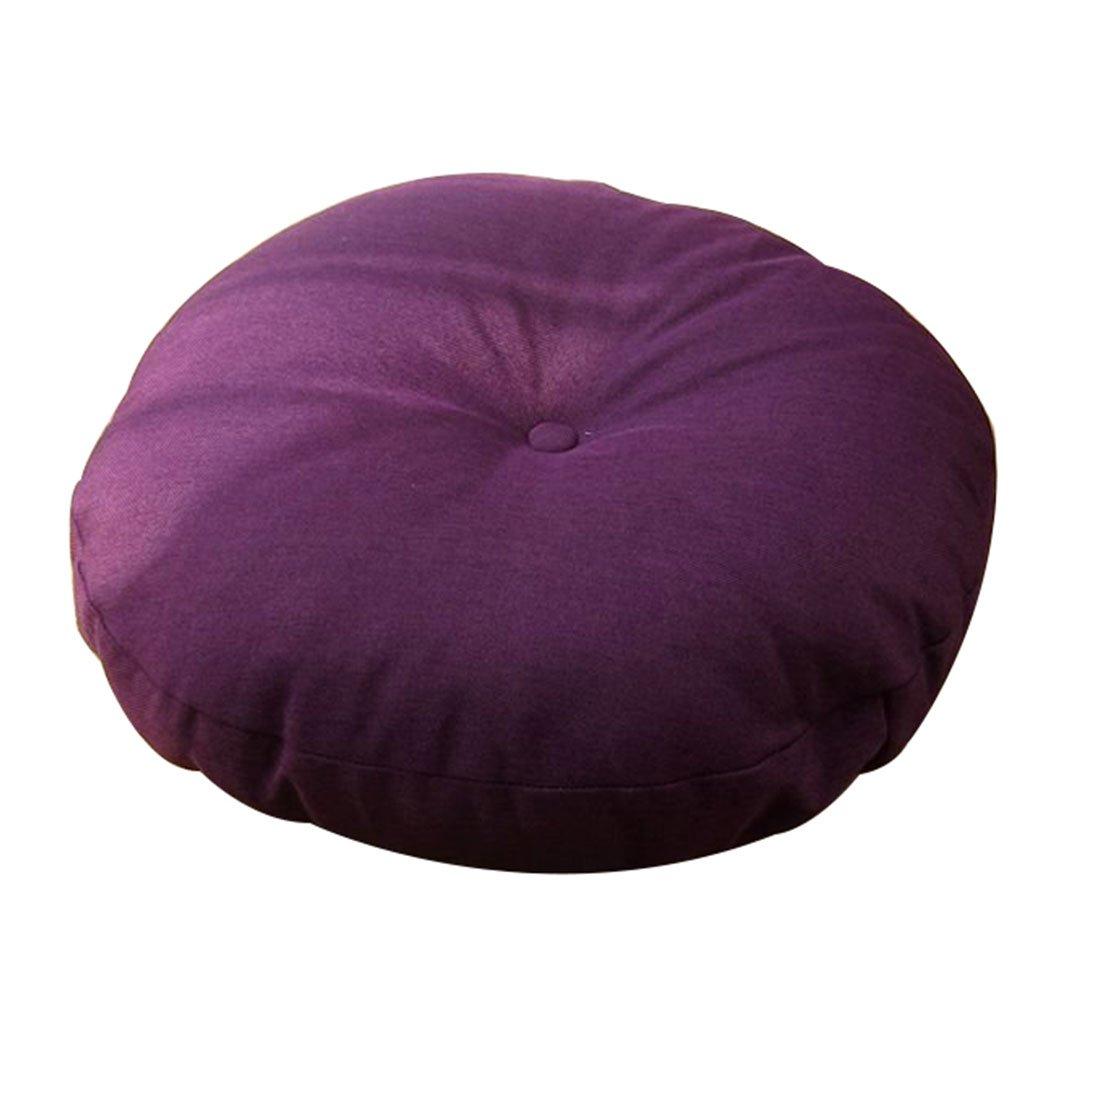 Prime Leader Japanese Style Linen Zafu Meditation Yoga Bolster Tatami Floor Pillow Cushion Japanese Futon Round Seat Cushion Thicken Chair Window Pad,Purple,15.7x4.7in(D x H